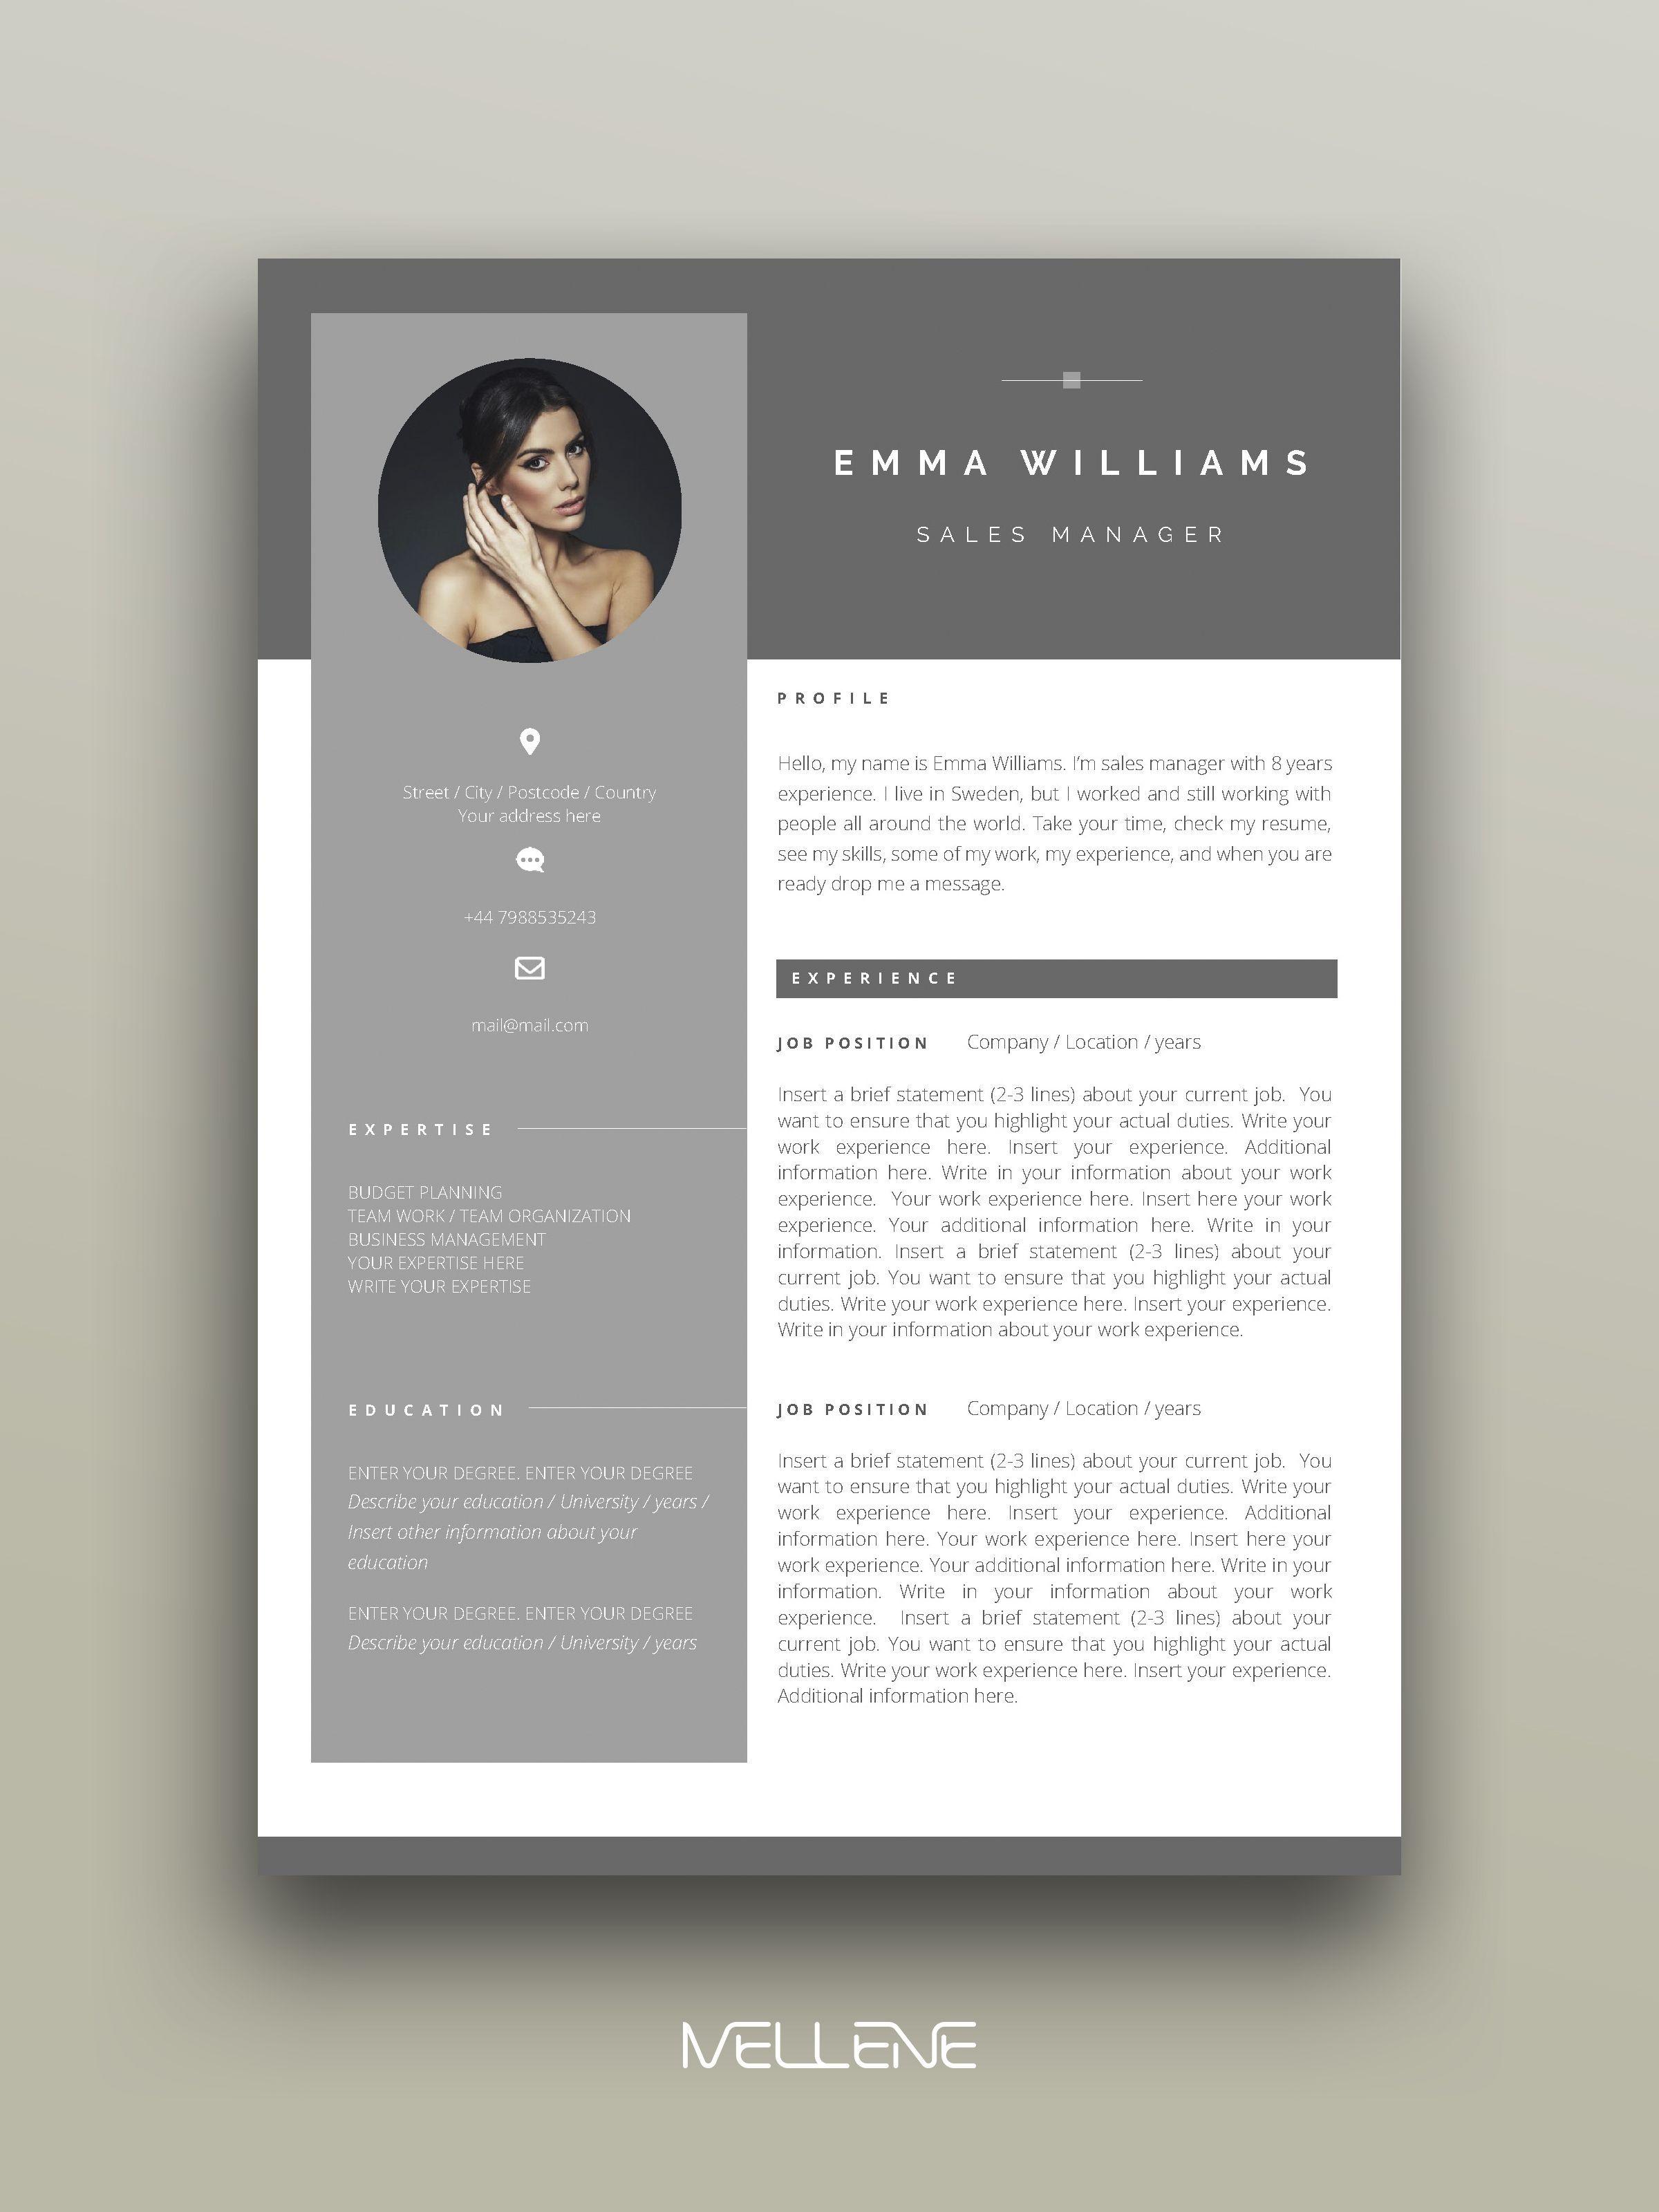 2 Page Resume Cv Design Cover Letter Free Icons And Usage Manual Professional Creative Layout Sjablonen Sollicitatiegesprek Tips Sollicitatiegesprekken